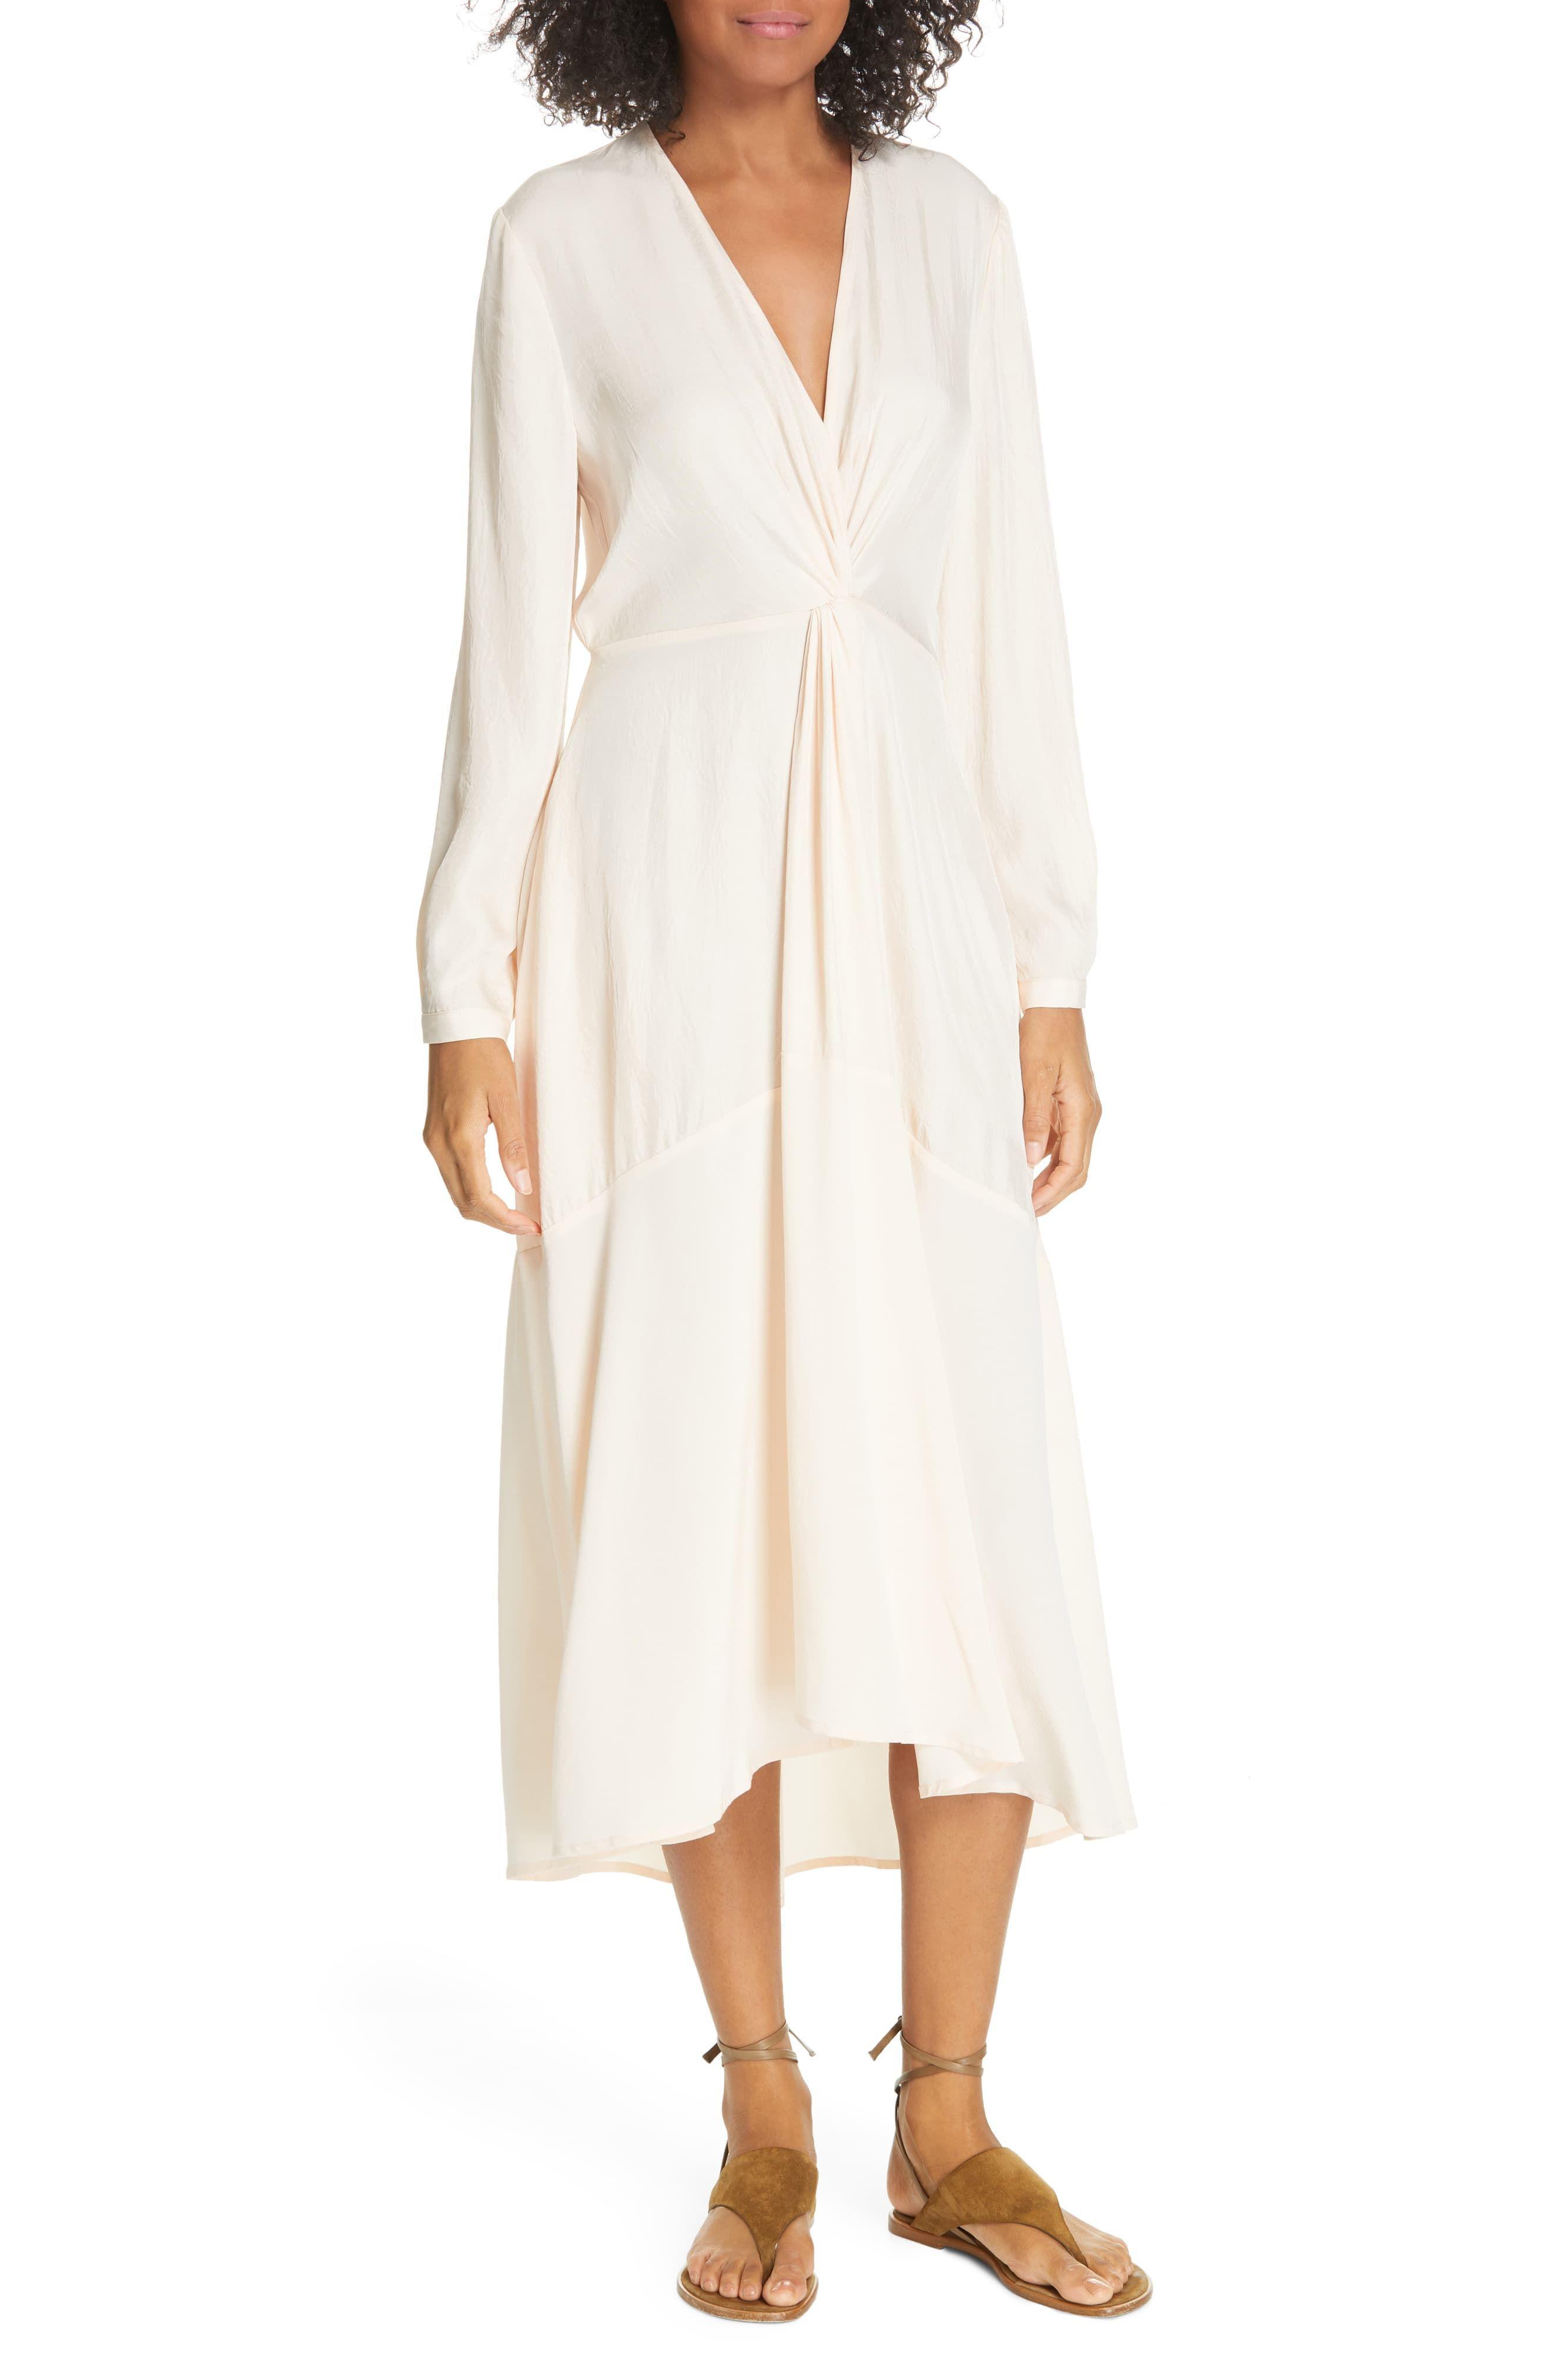 Vince Twist Drape Long Sleeve Dress Size 4 Oat Blush At Nordstrom Rack In 2021 Nordstrom Dresses Draped Dress Clothes For Women [ 4048 x 2640 Pixel ]